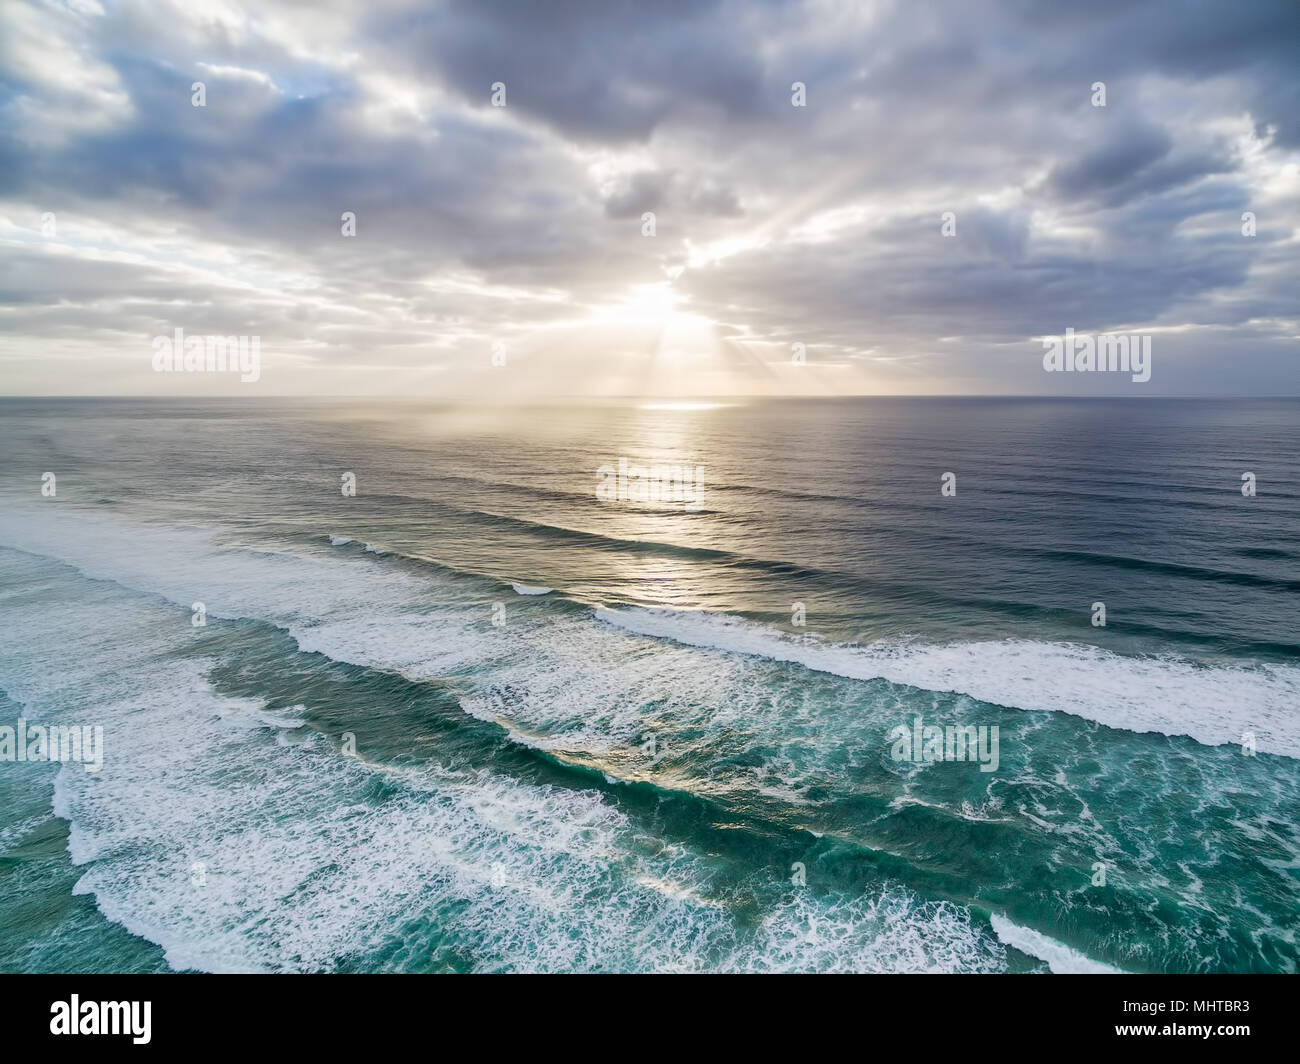 Sunset over ocean - minimalist landscape - Stock Image